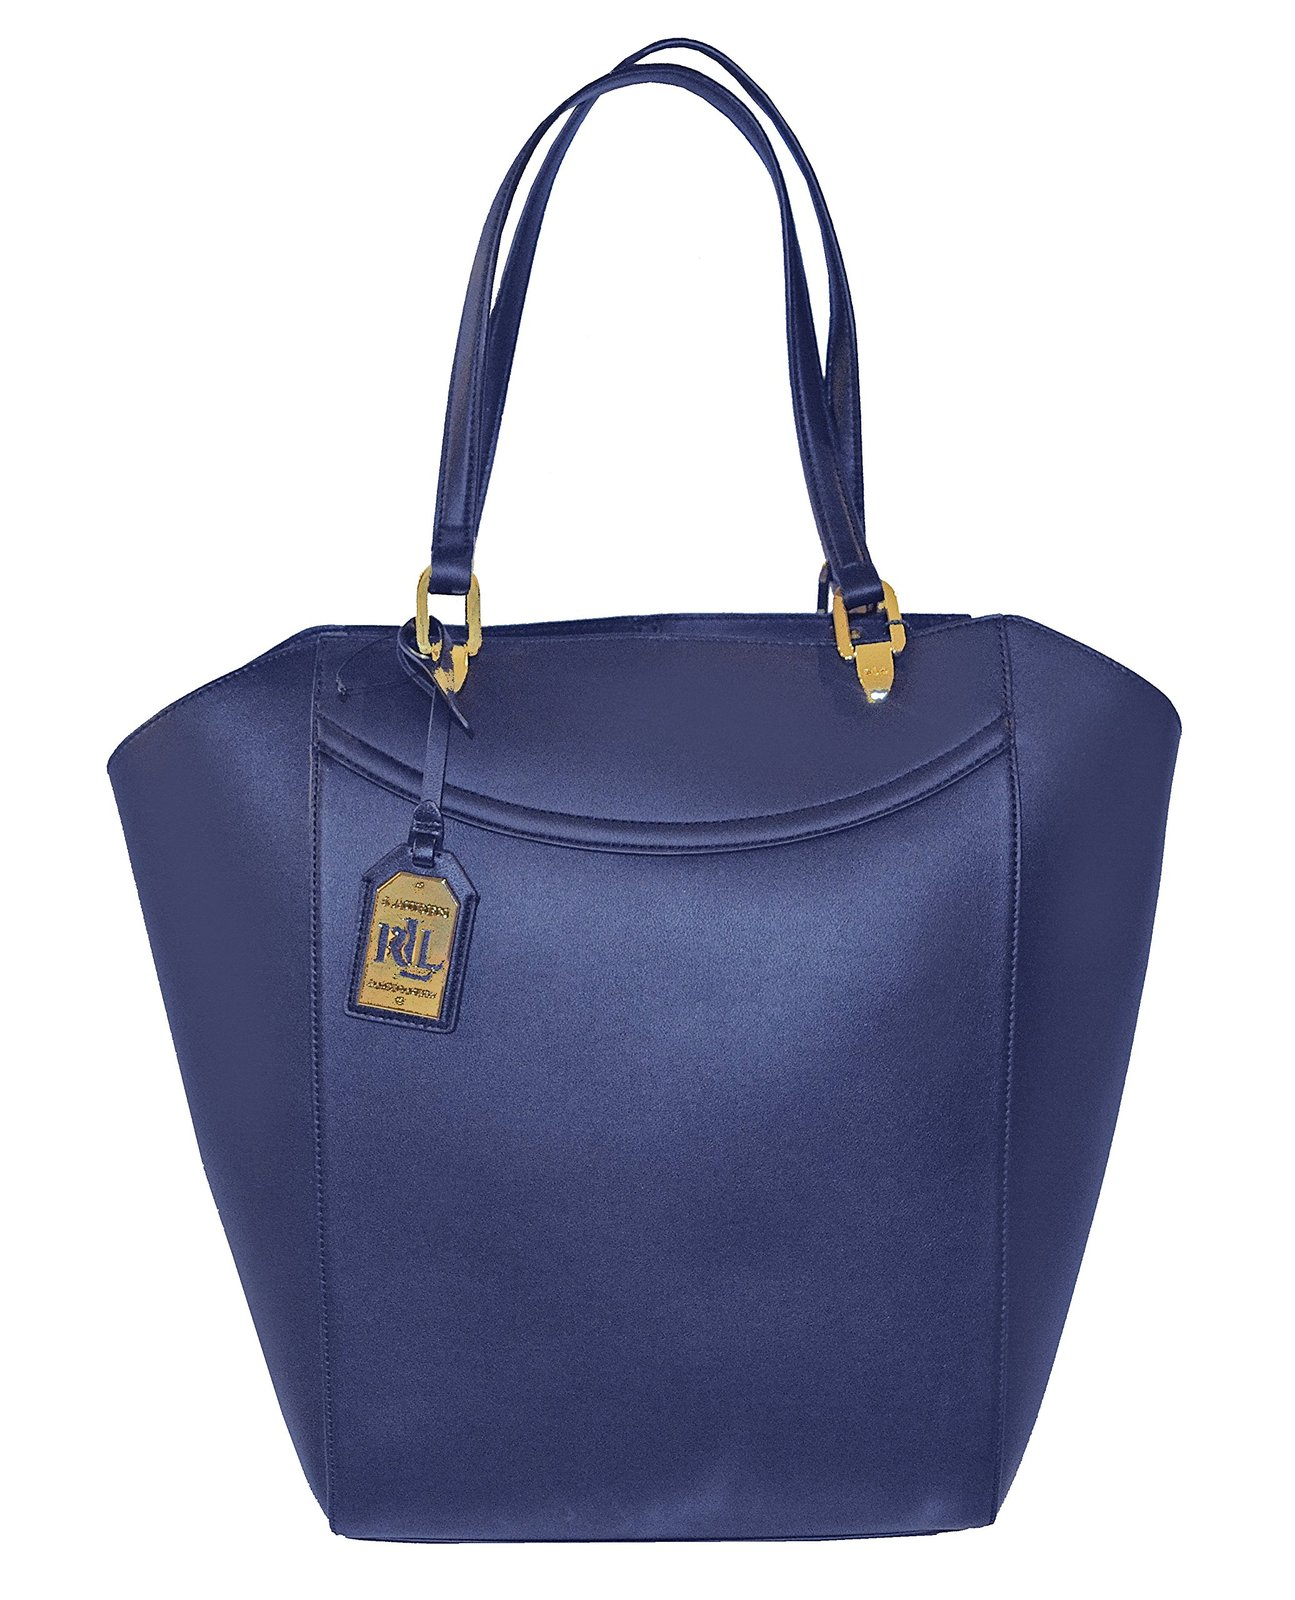 4f98745d6ffd LAUREN Ralph Lauren Lexington Tote Bag and 46 similar items. 91rkefwq8vl